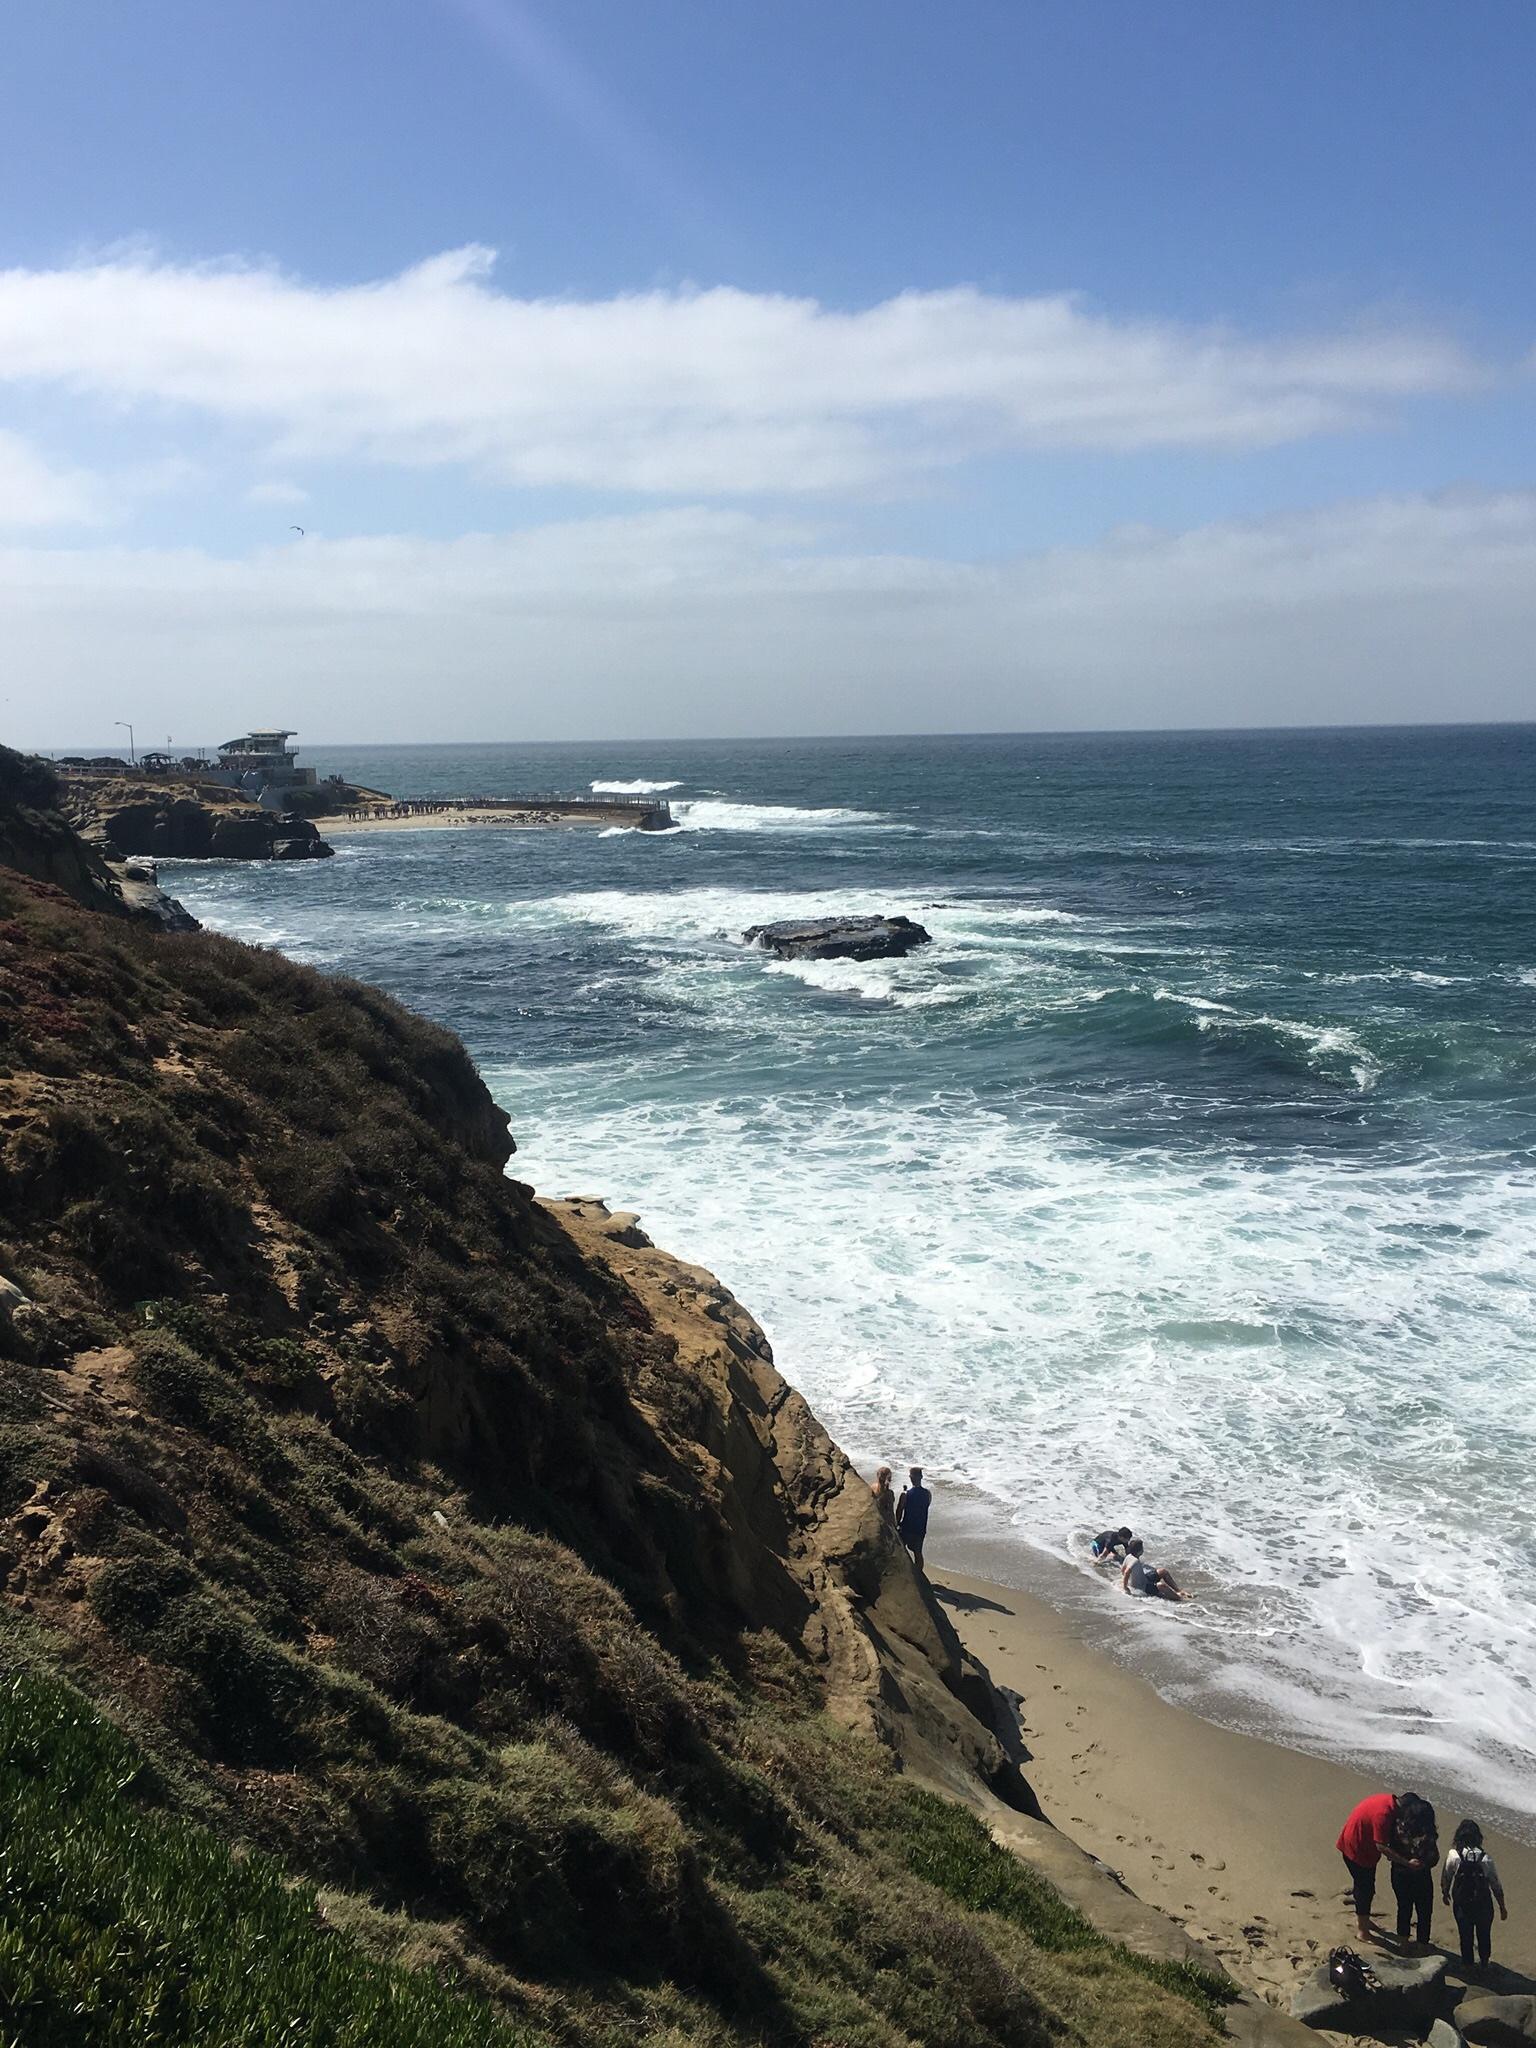 Photo courtesy of Fefe @ La Jolla California